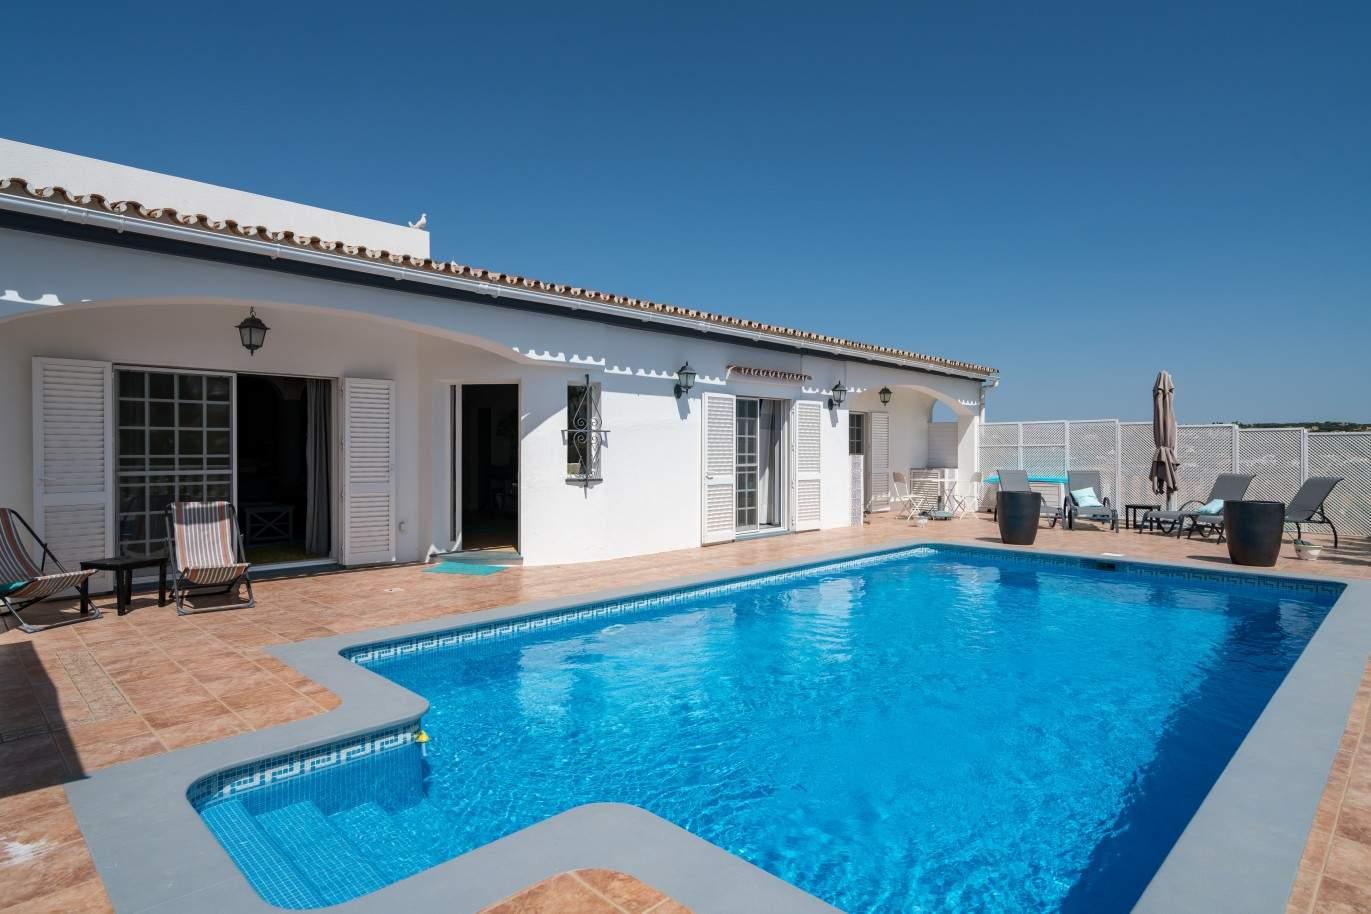 villa-5-chambres-avec-piscine-et-jardin-sao-bras-de-alportel-algarve